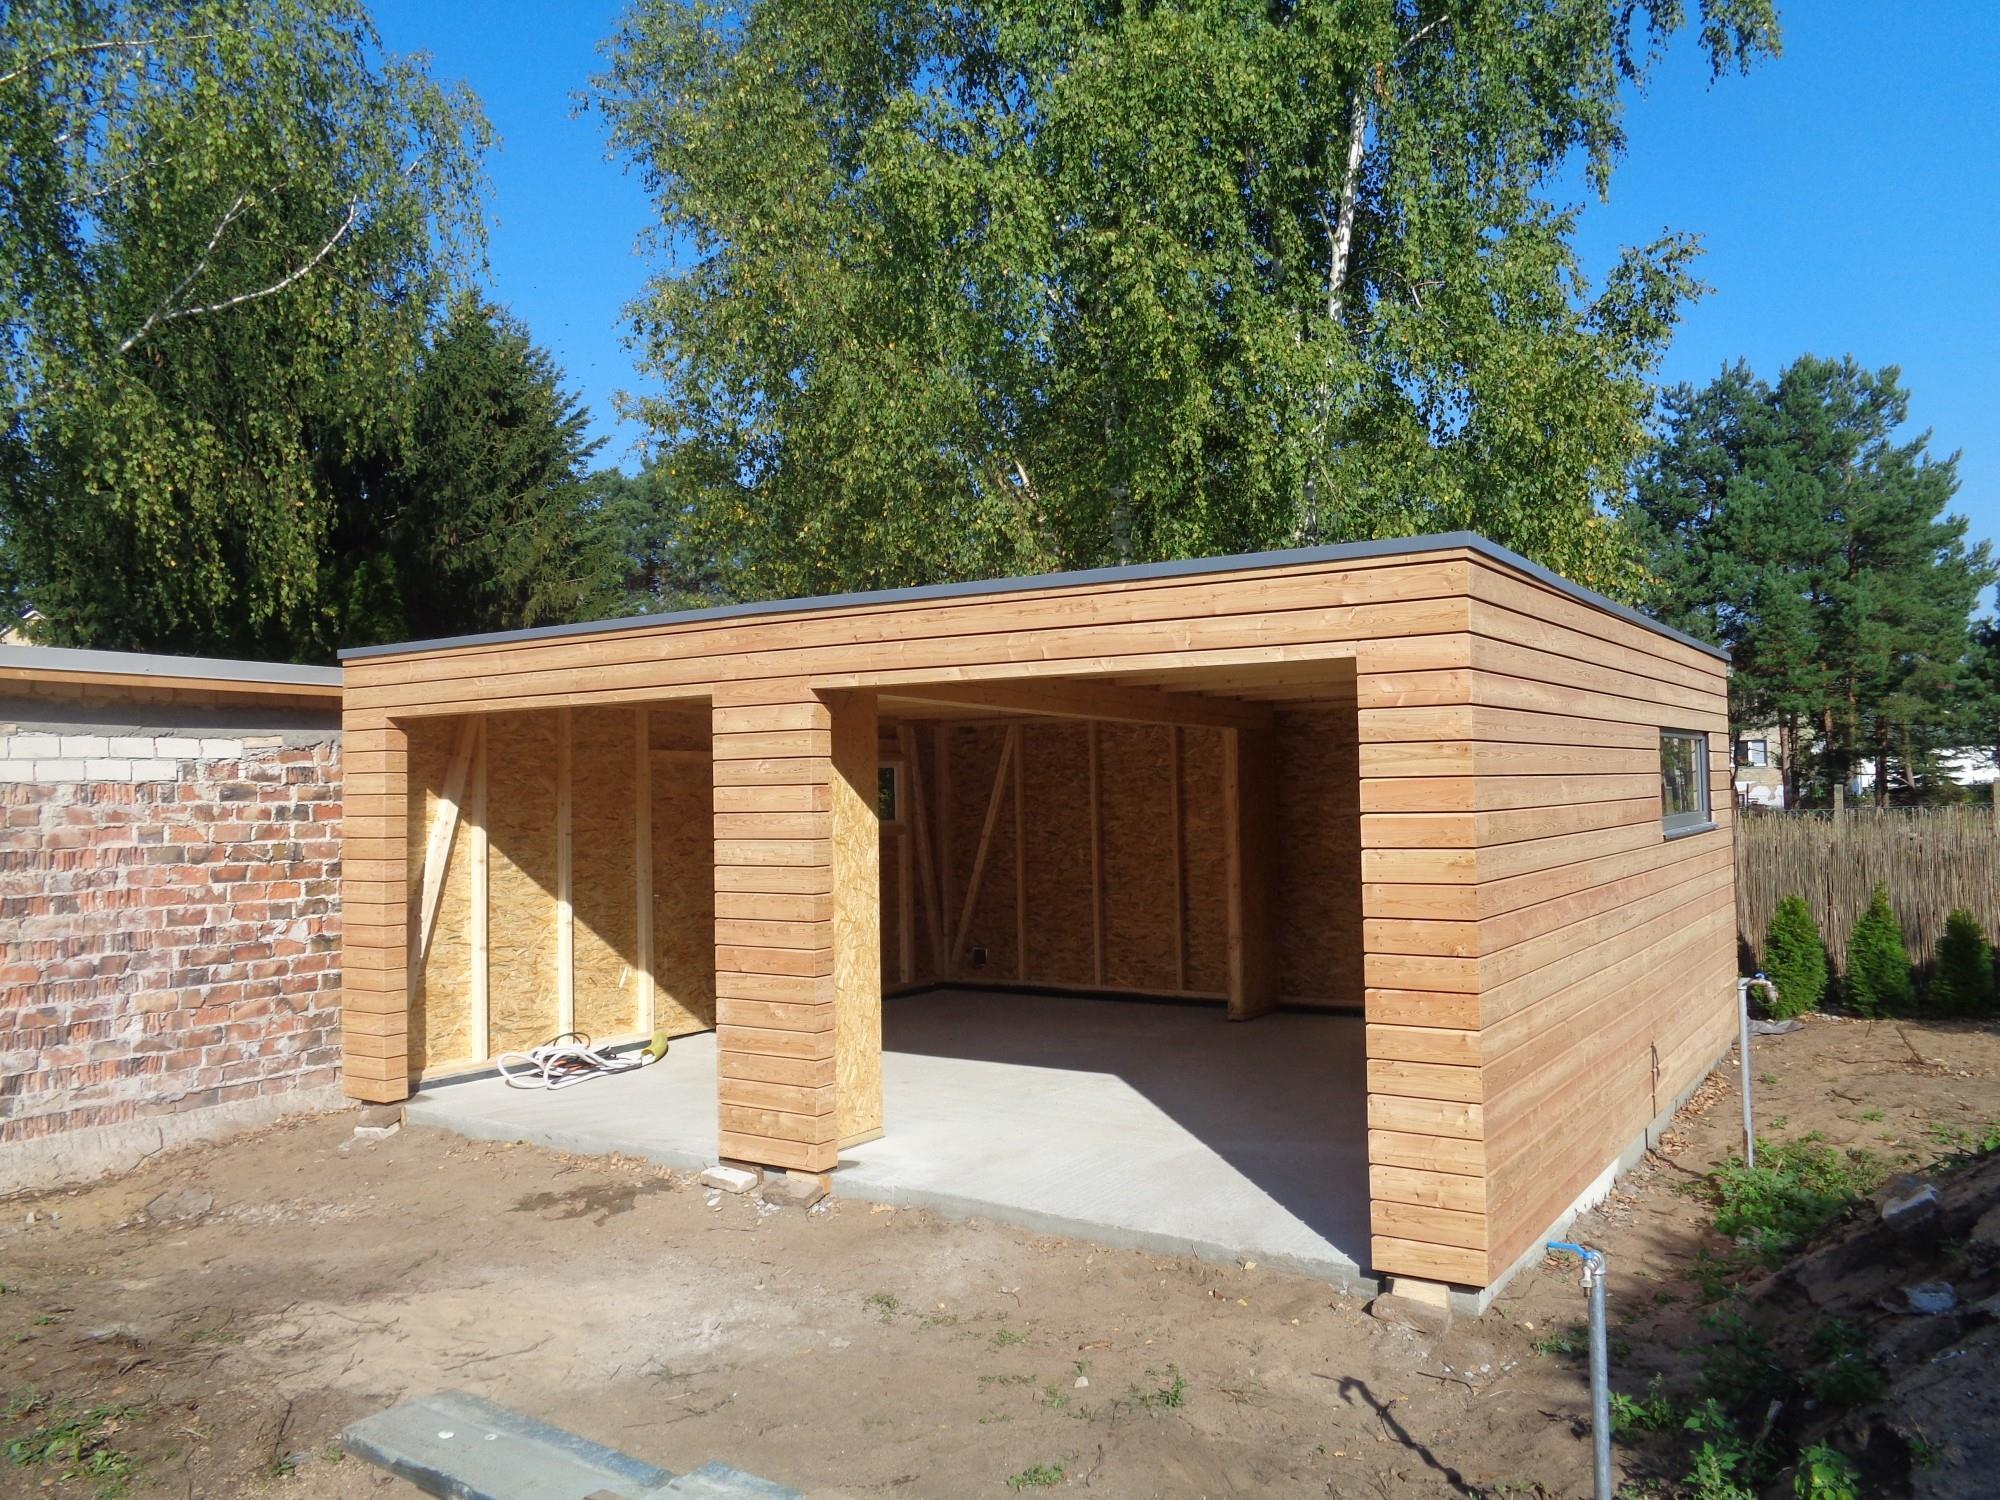 Holzgarage 5 7x6 3 M Naturhouse G5 7 6 Moderne